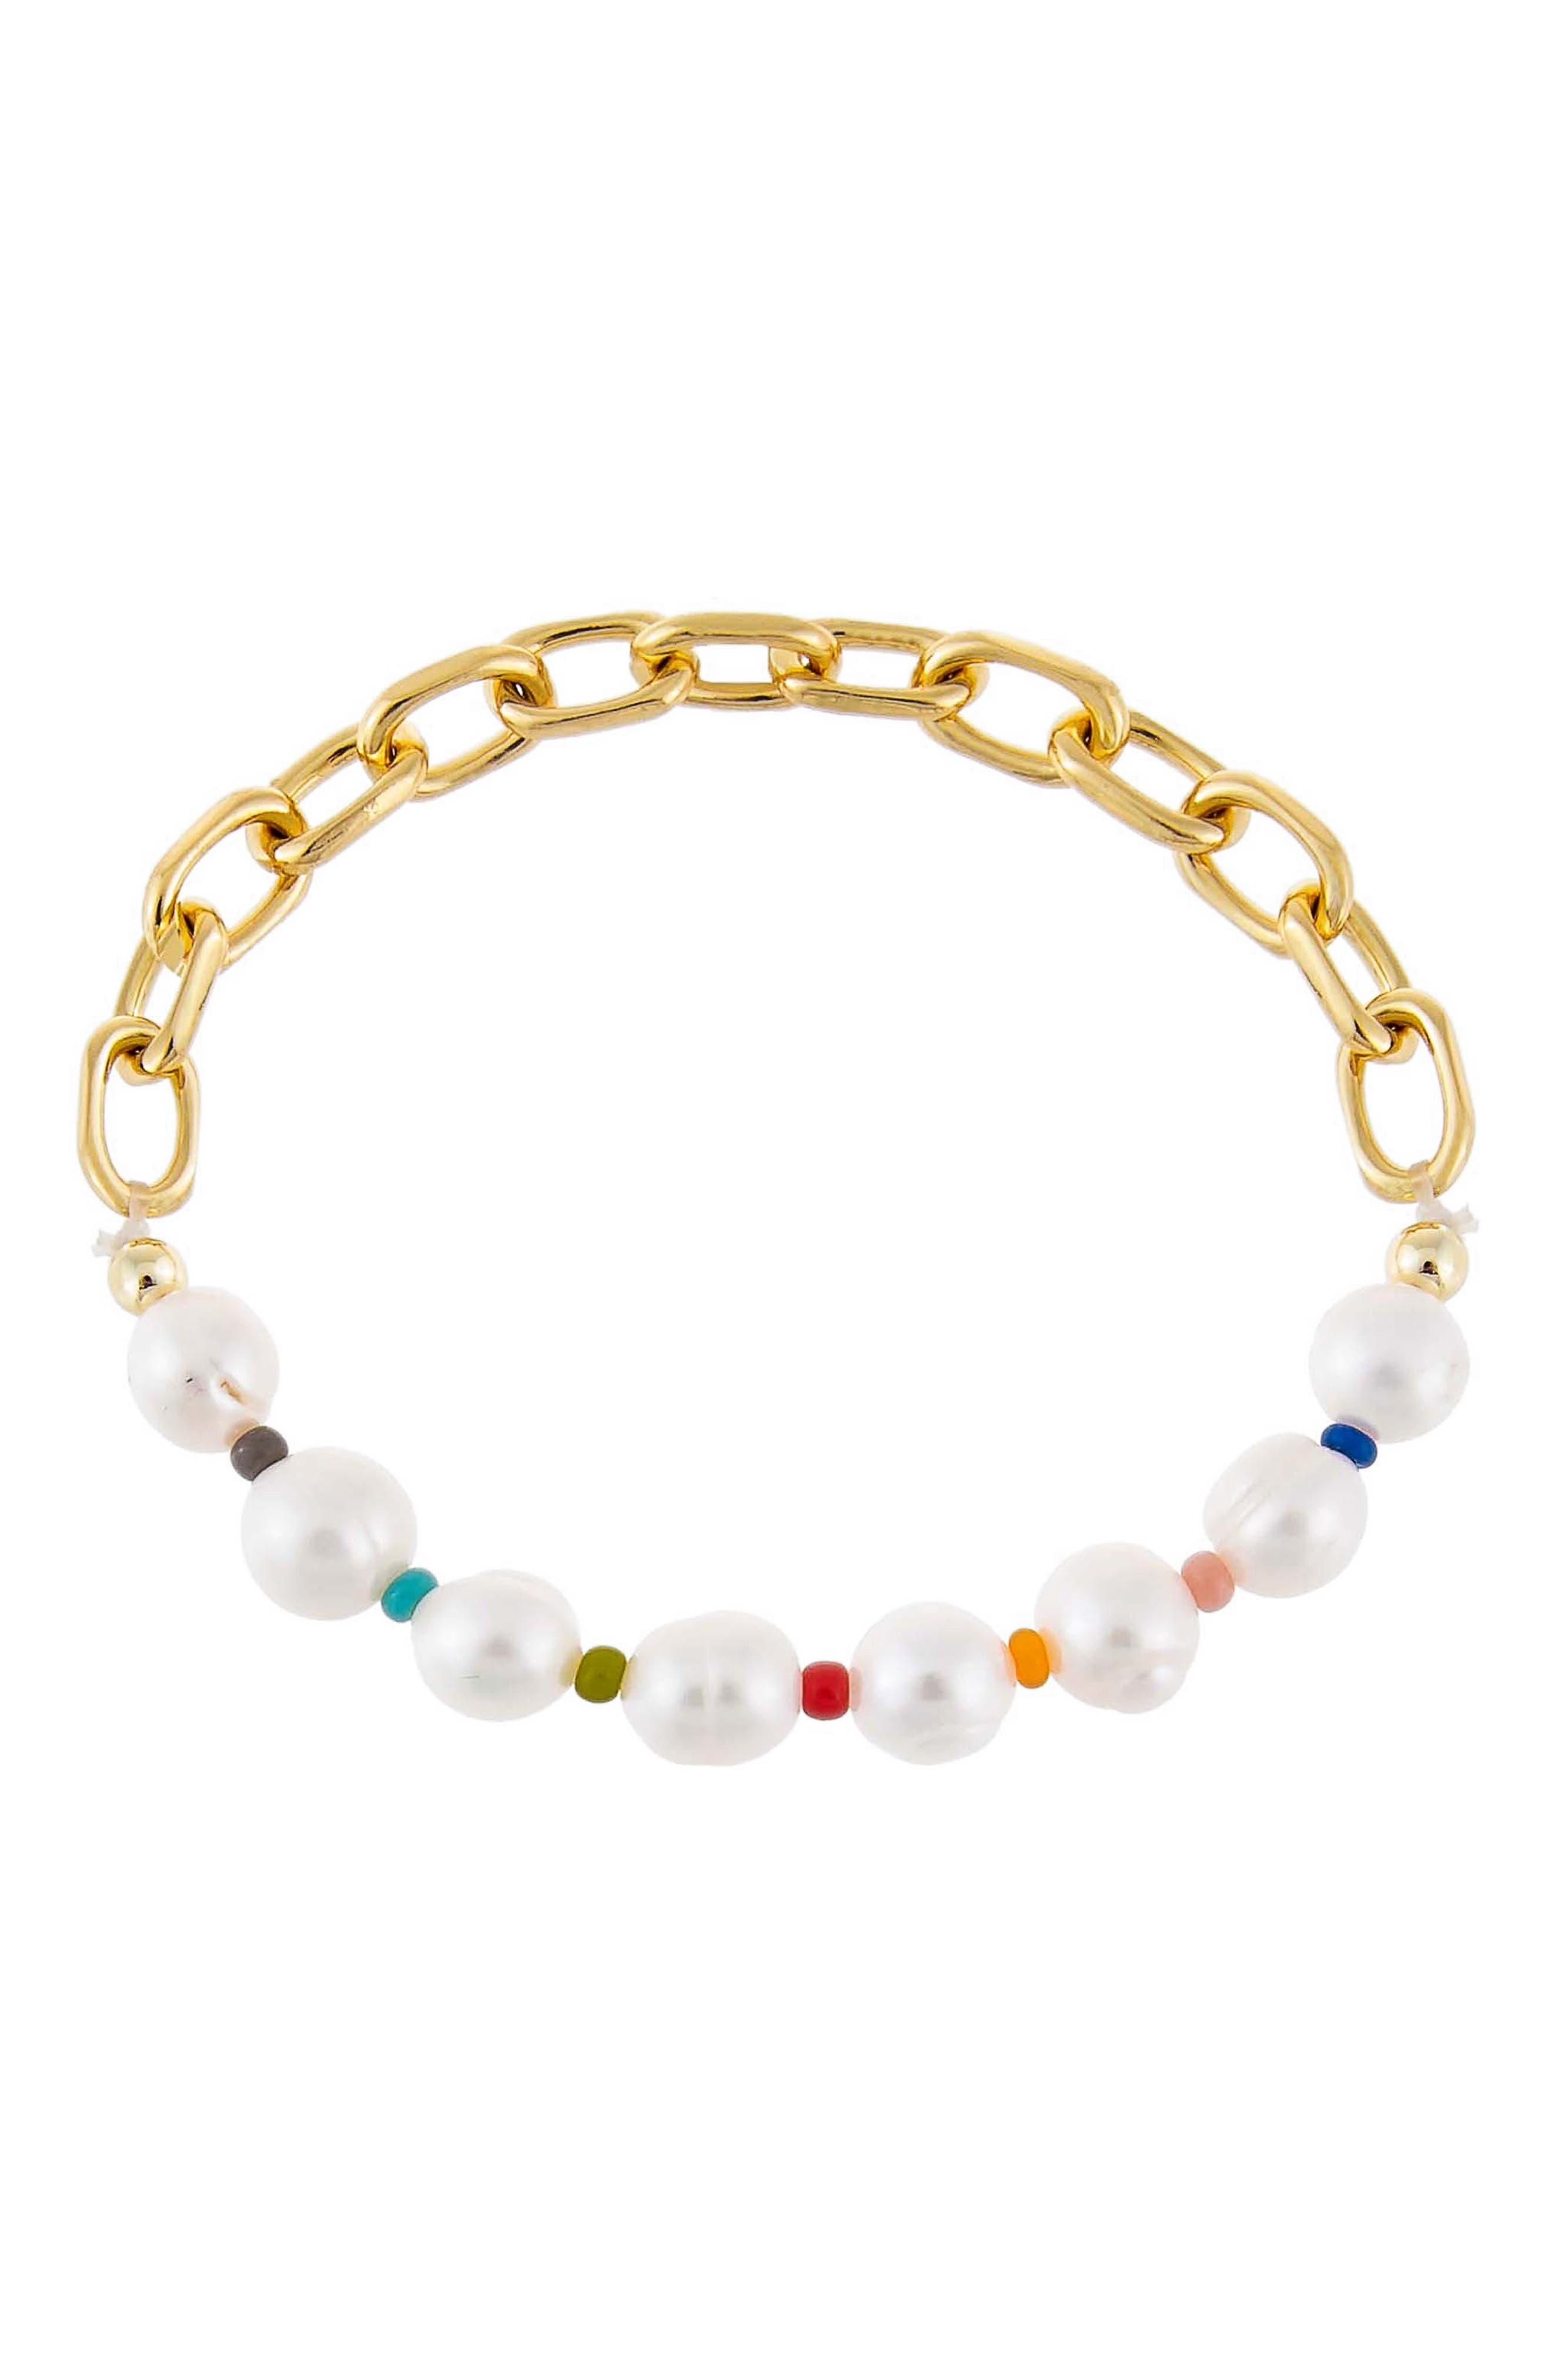 Women's Adina's Jewels Multicolor Pearl X Link Bracelet